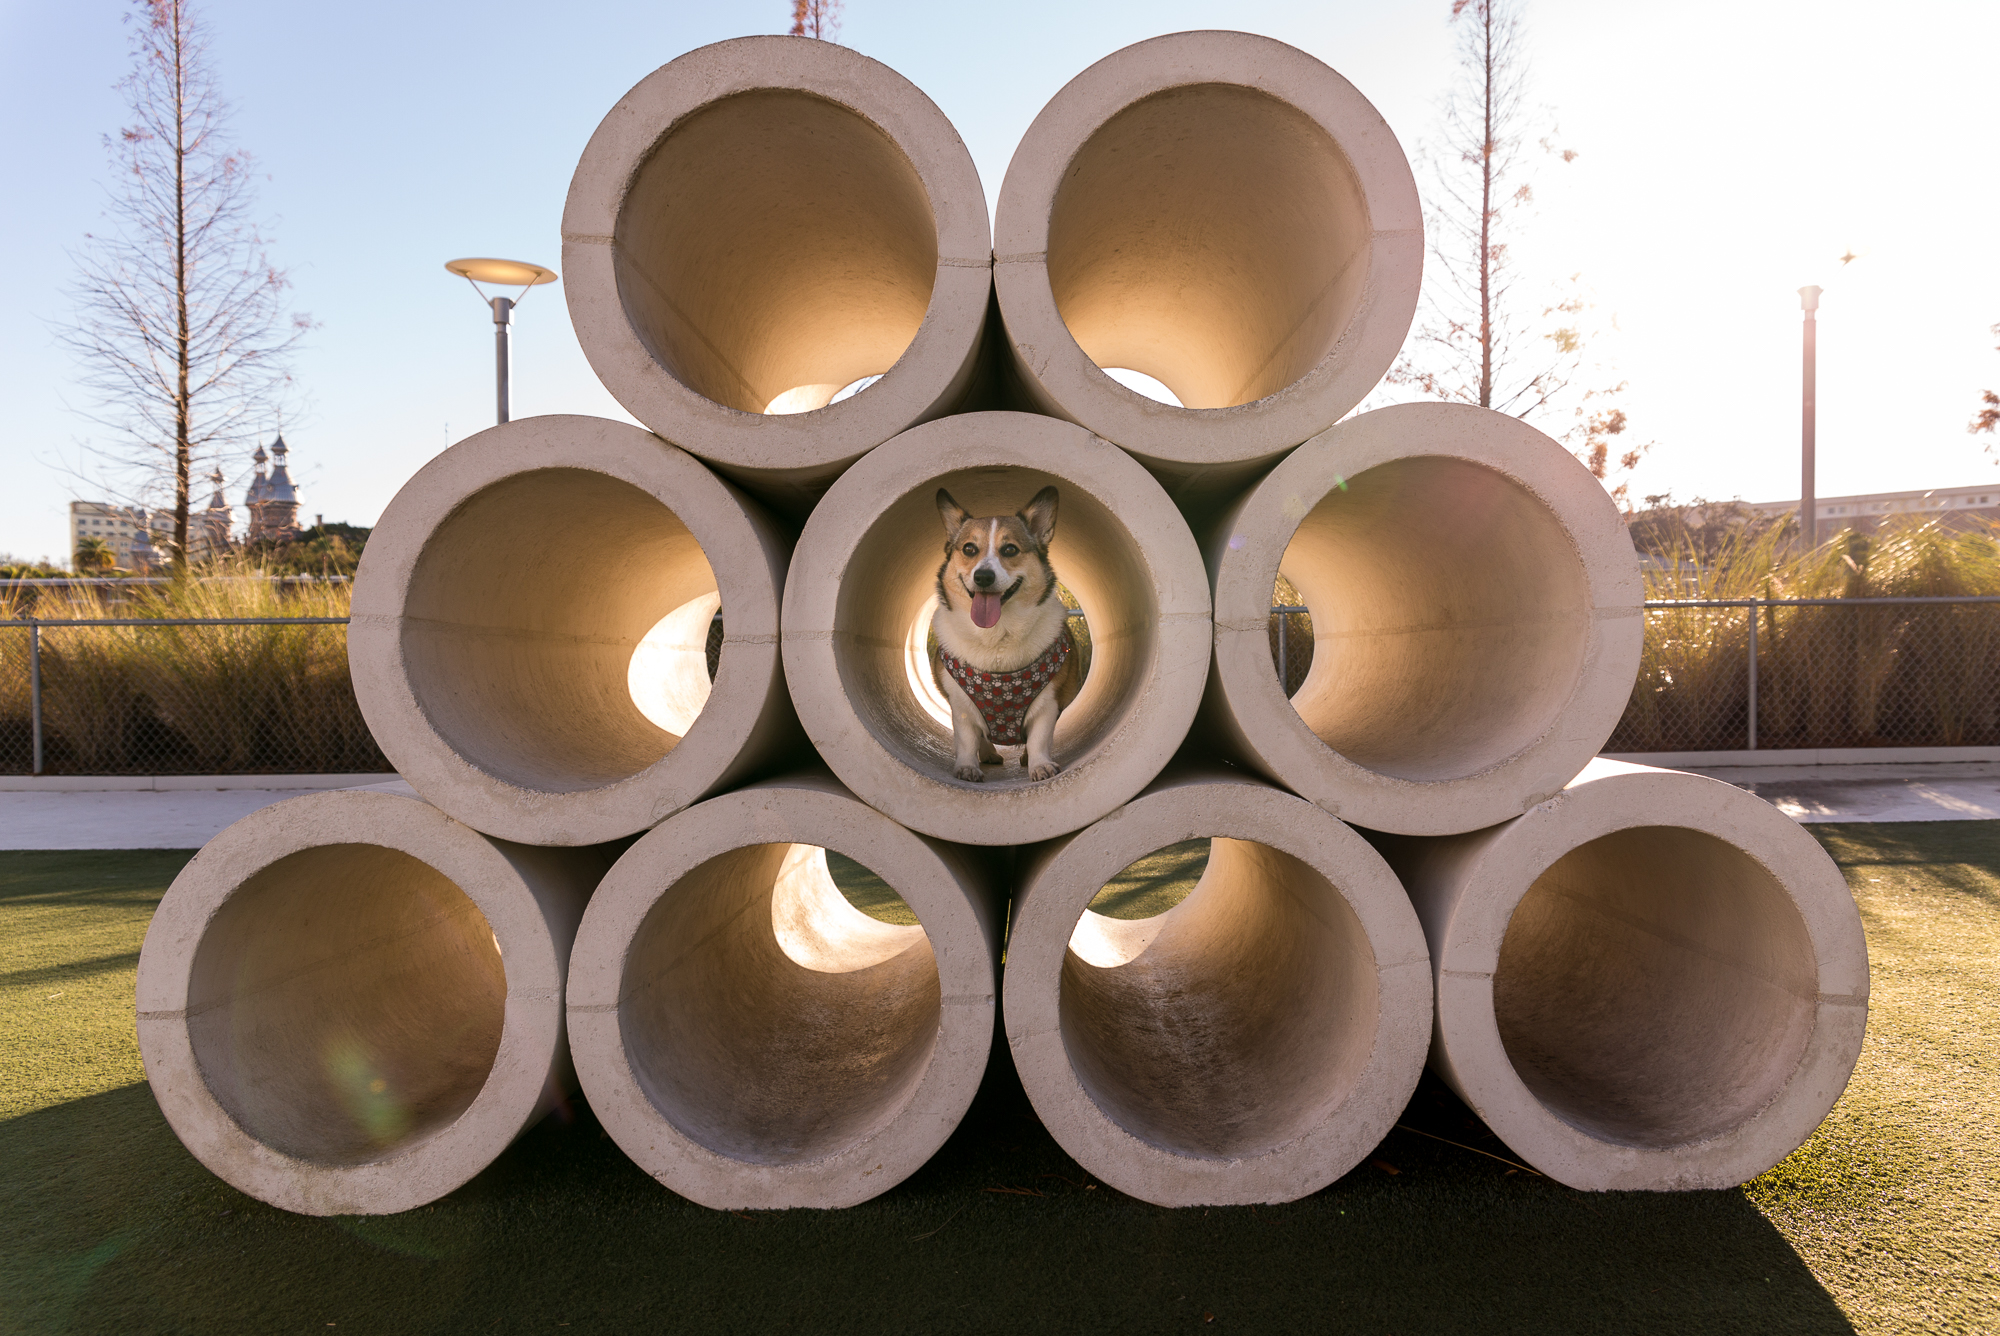 Kuma playing in the dog park